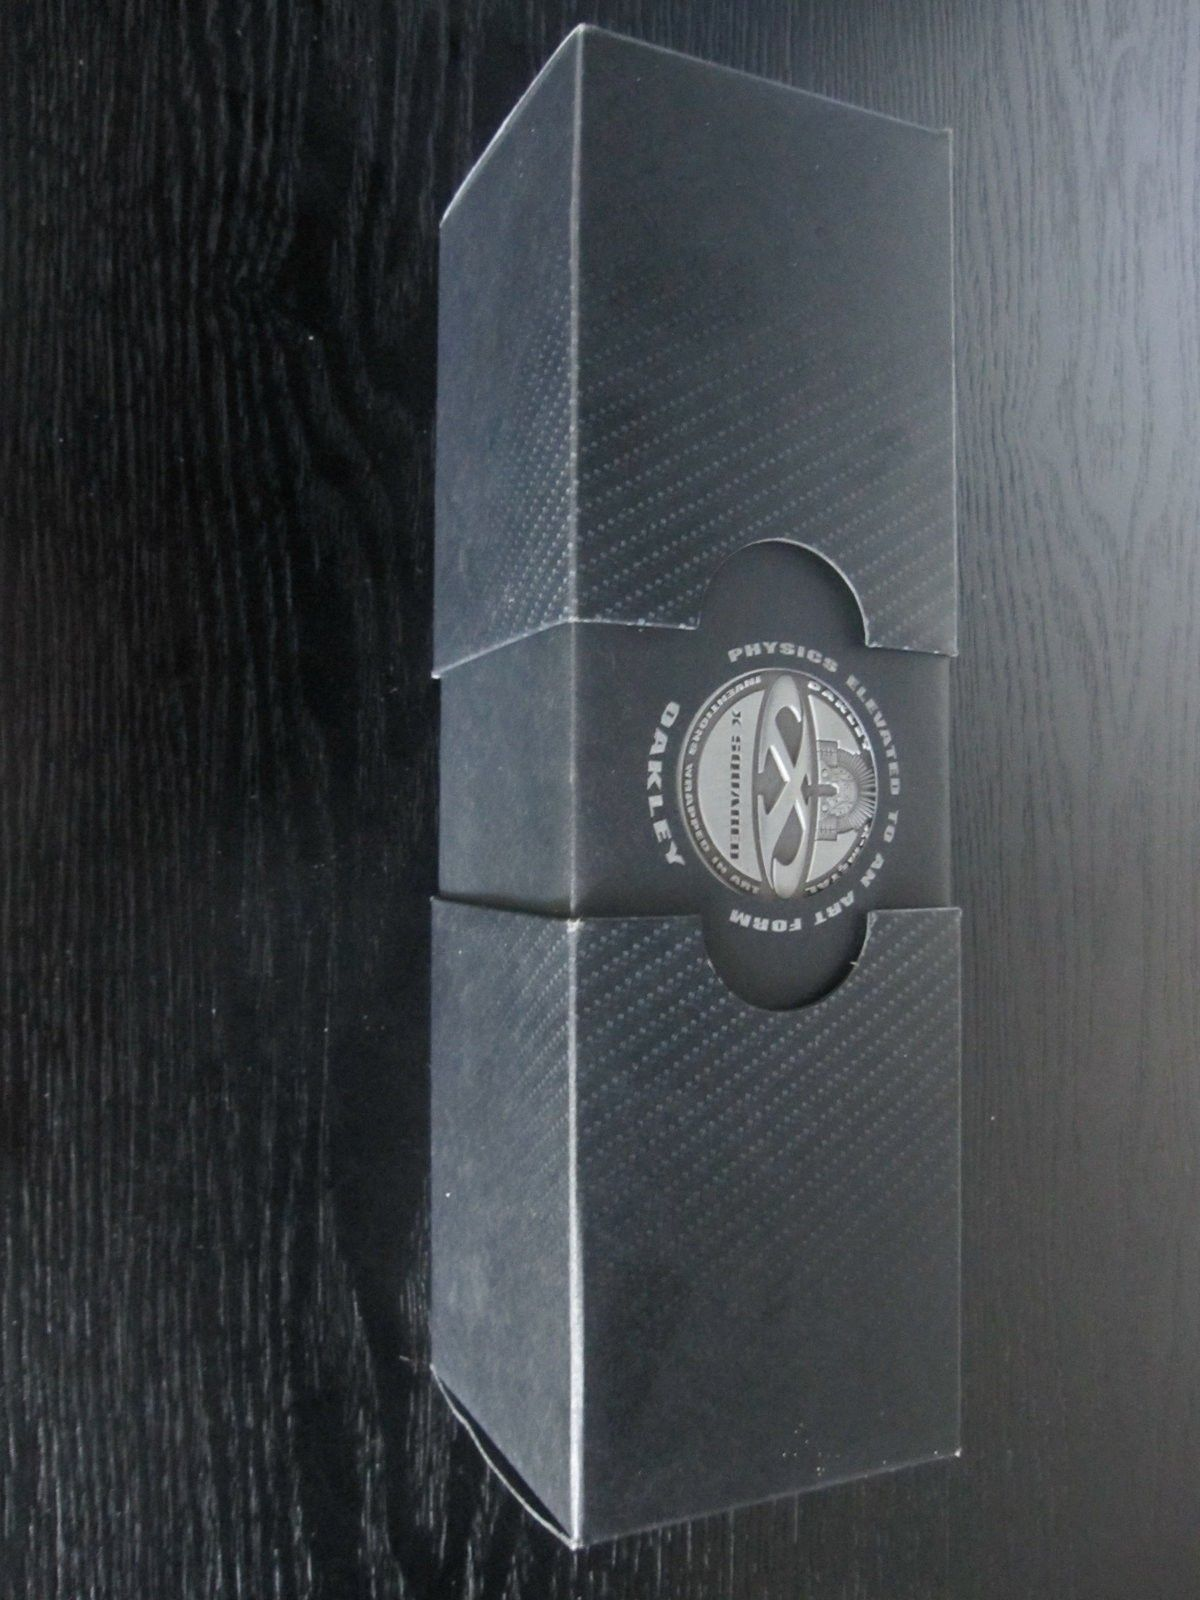 Box & coin for XS OO BIP - sku # 6011-08 - IMG_5545.JPG